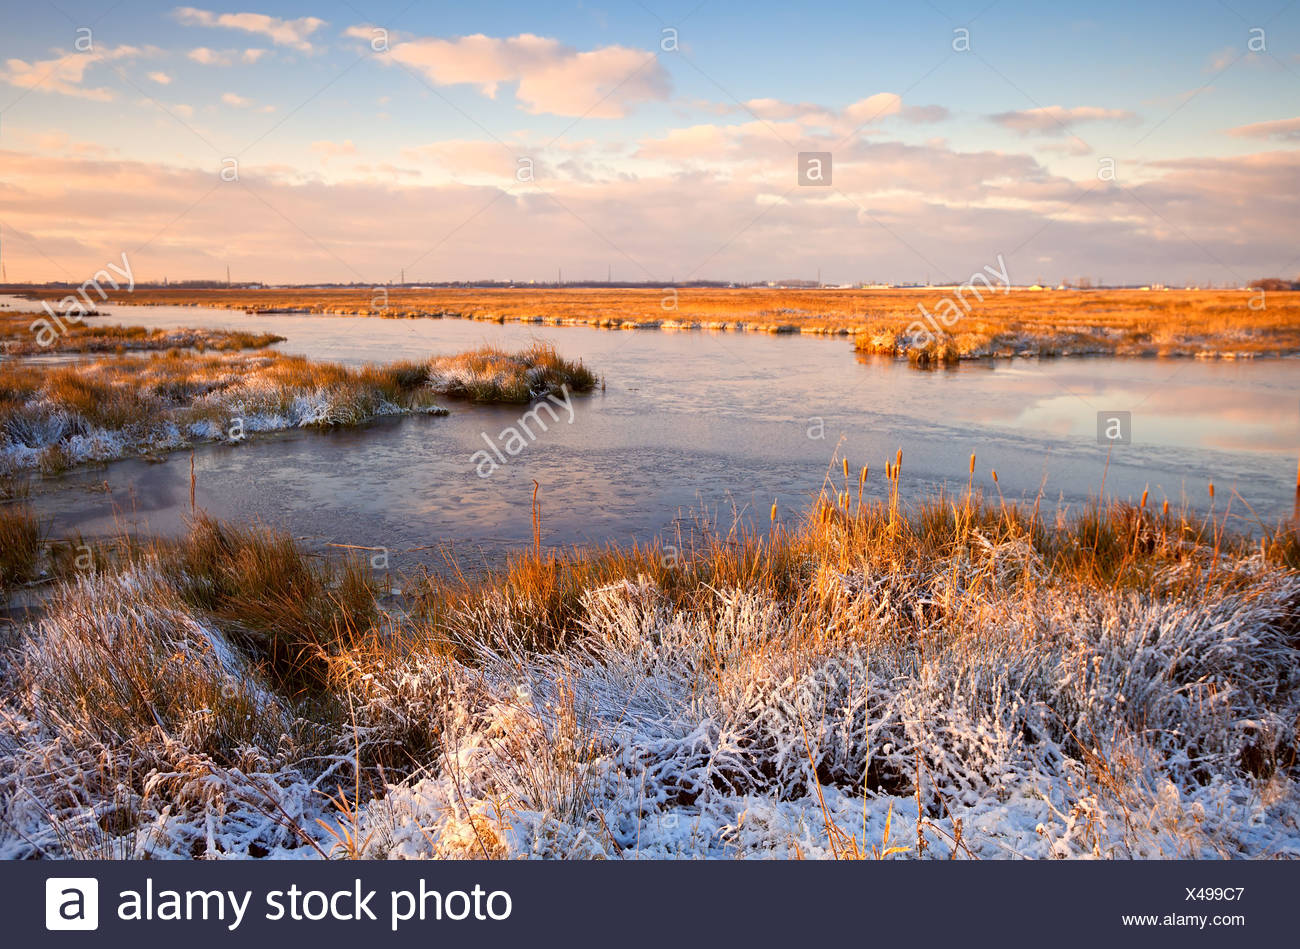 Sonnenaufgang über dem Sumpf im winter Stockbild